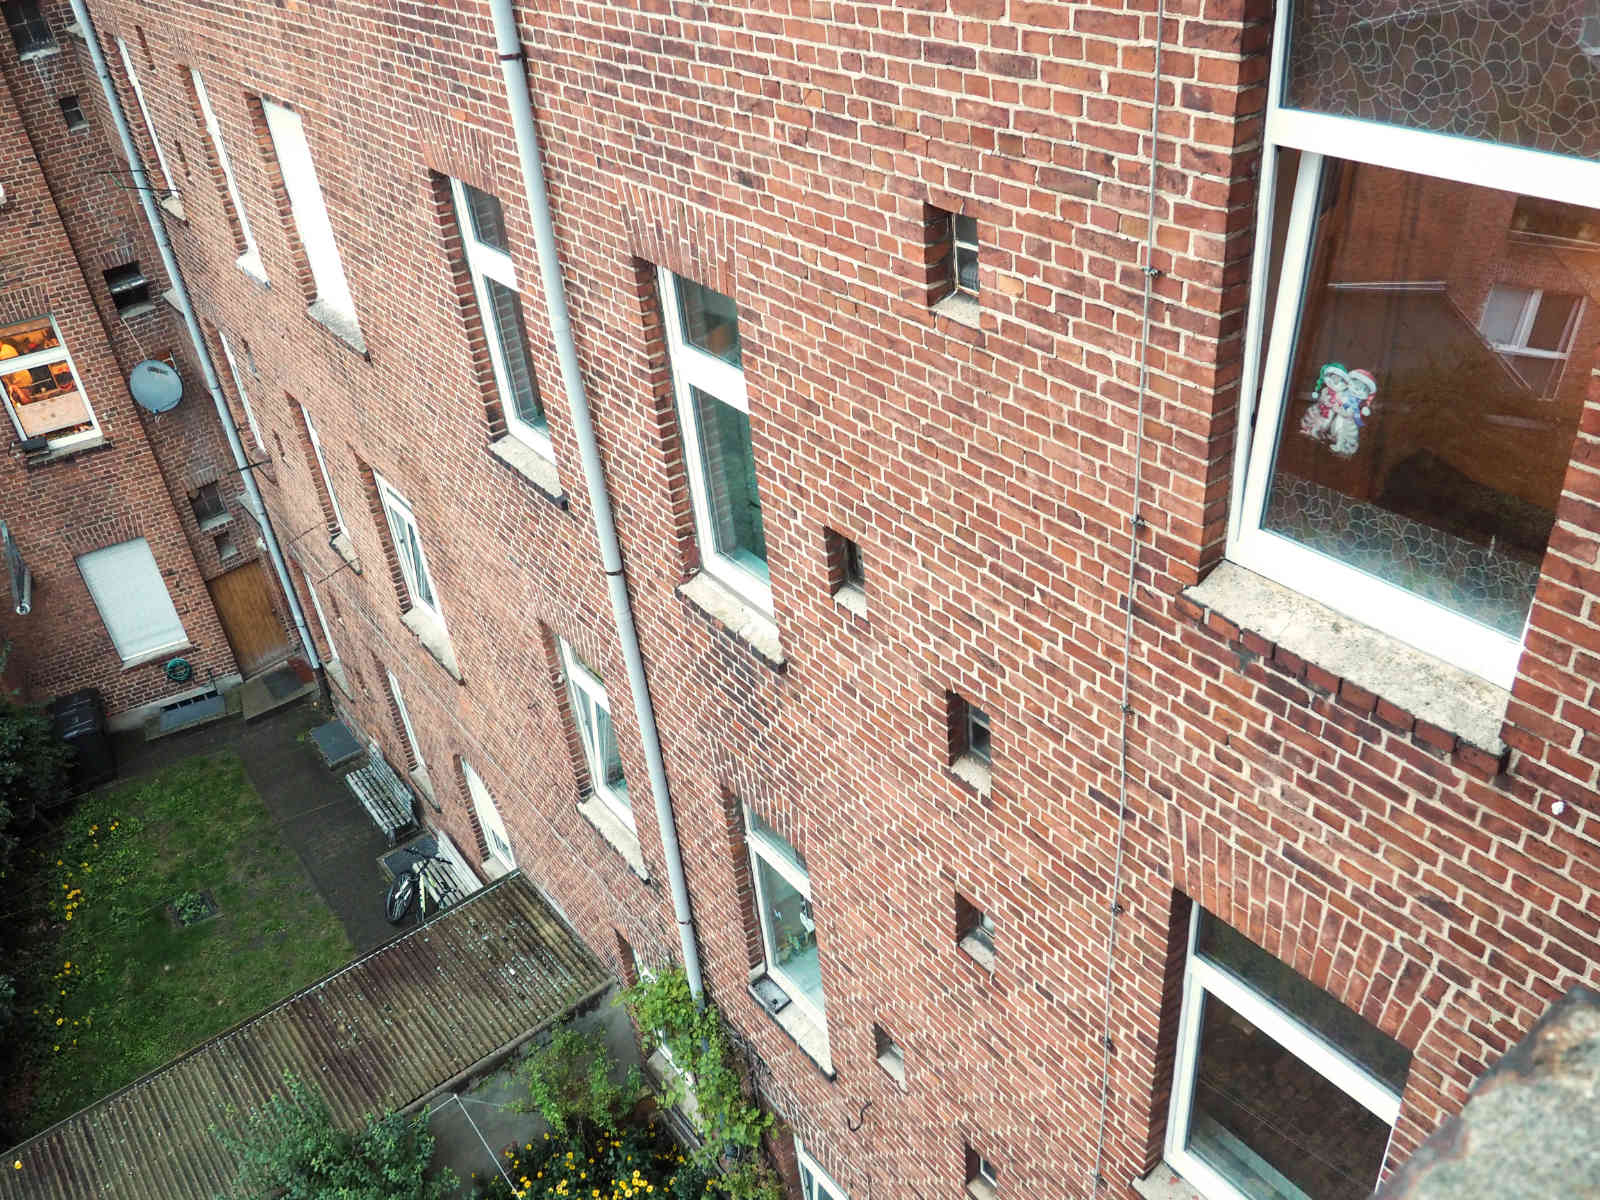 Rückansicht Immobilie in Wittenberge